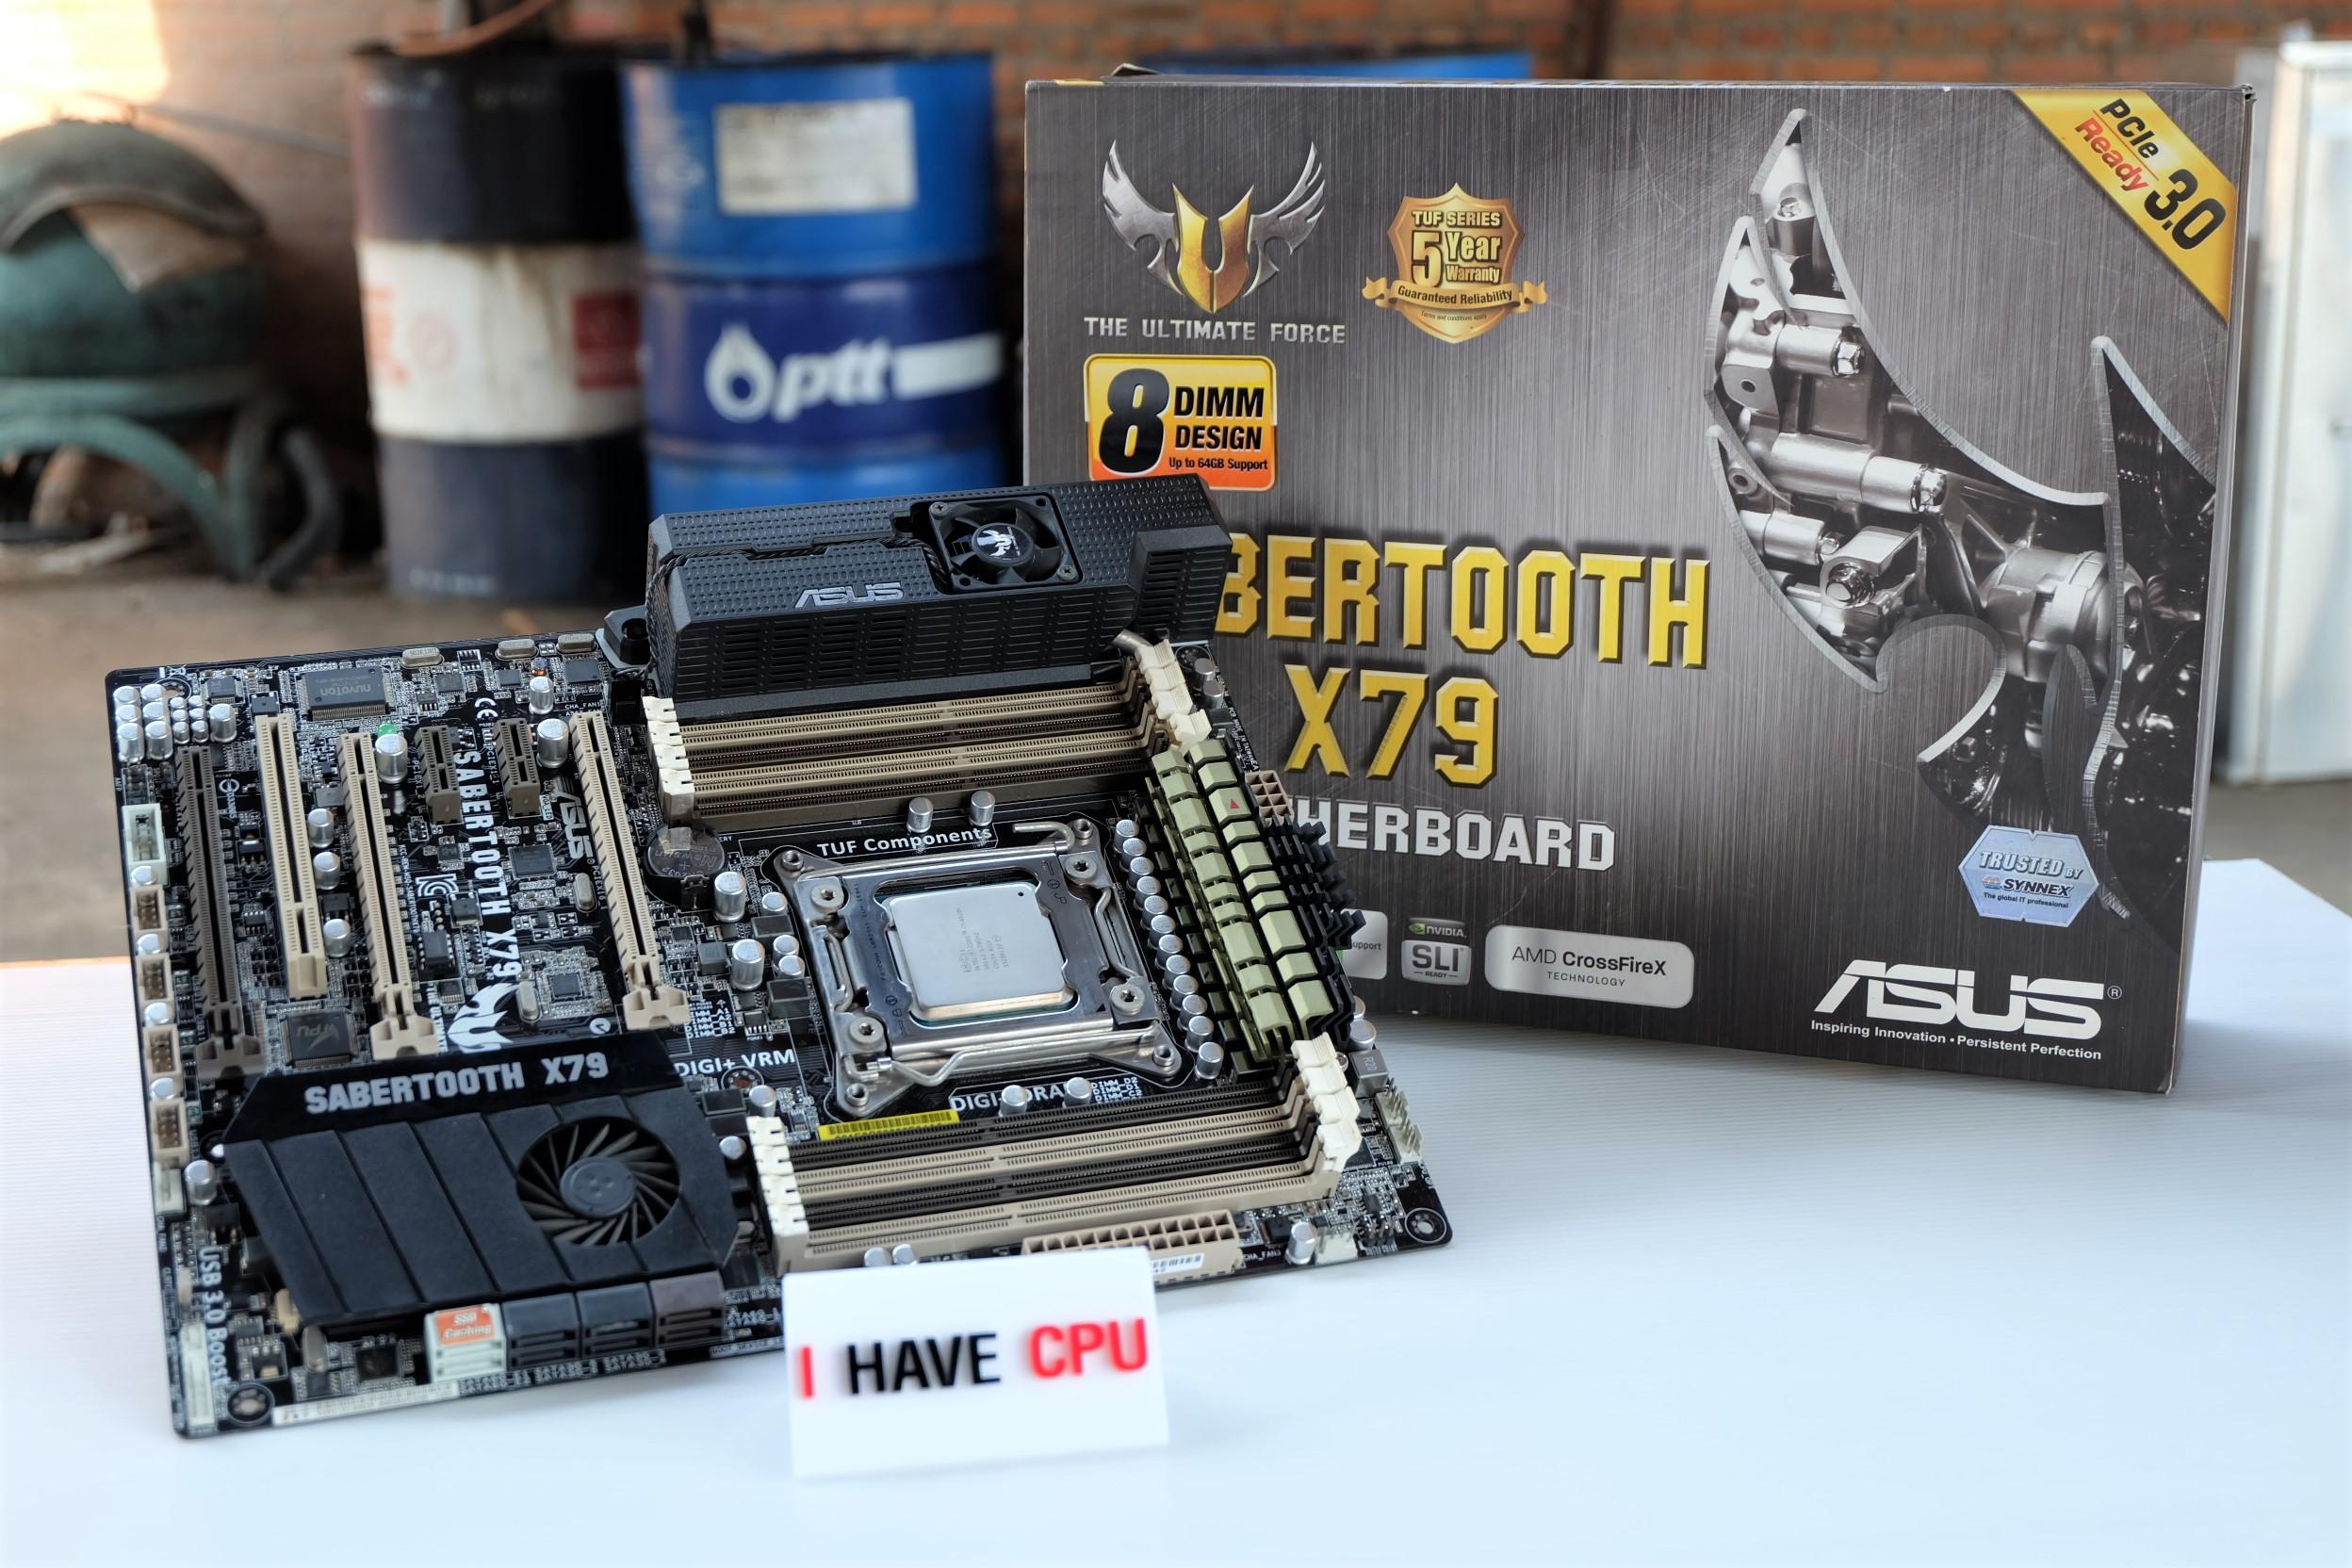 i7-4820K up to 3.9Ghz + ASUS Sabertooth X79